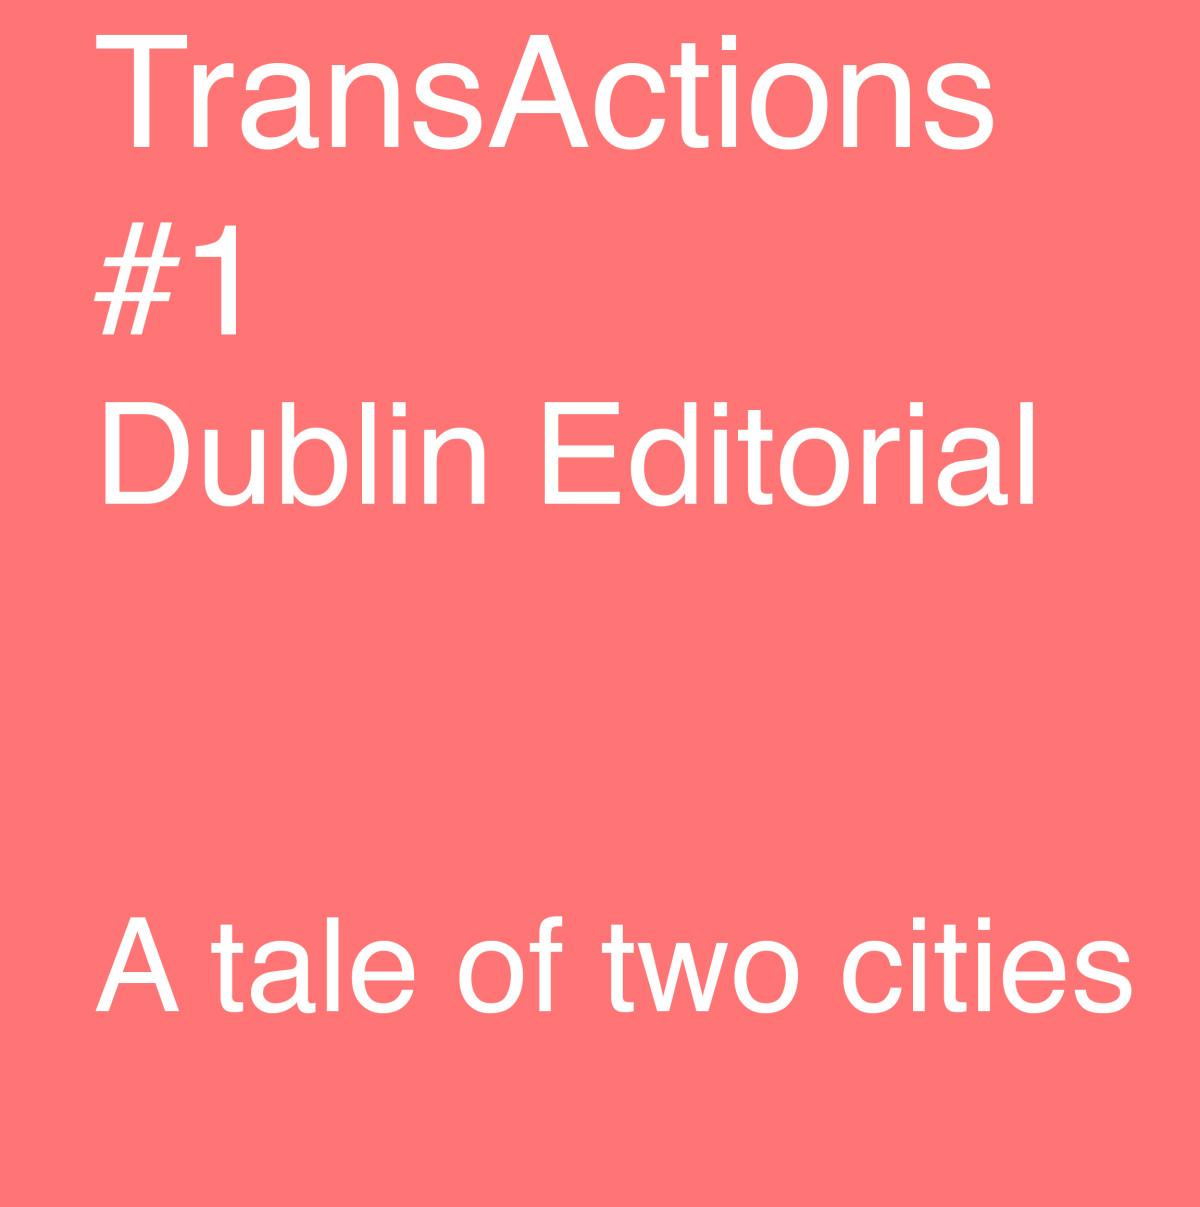 dublin editorial 1